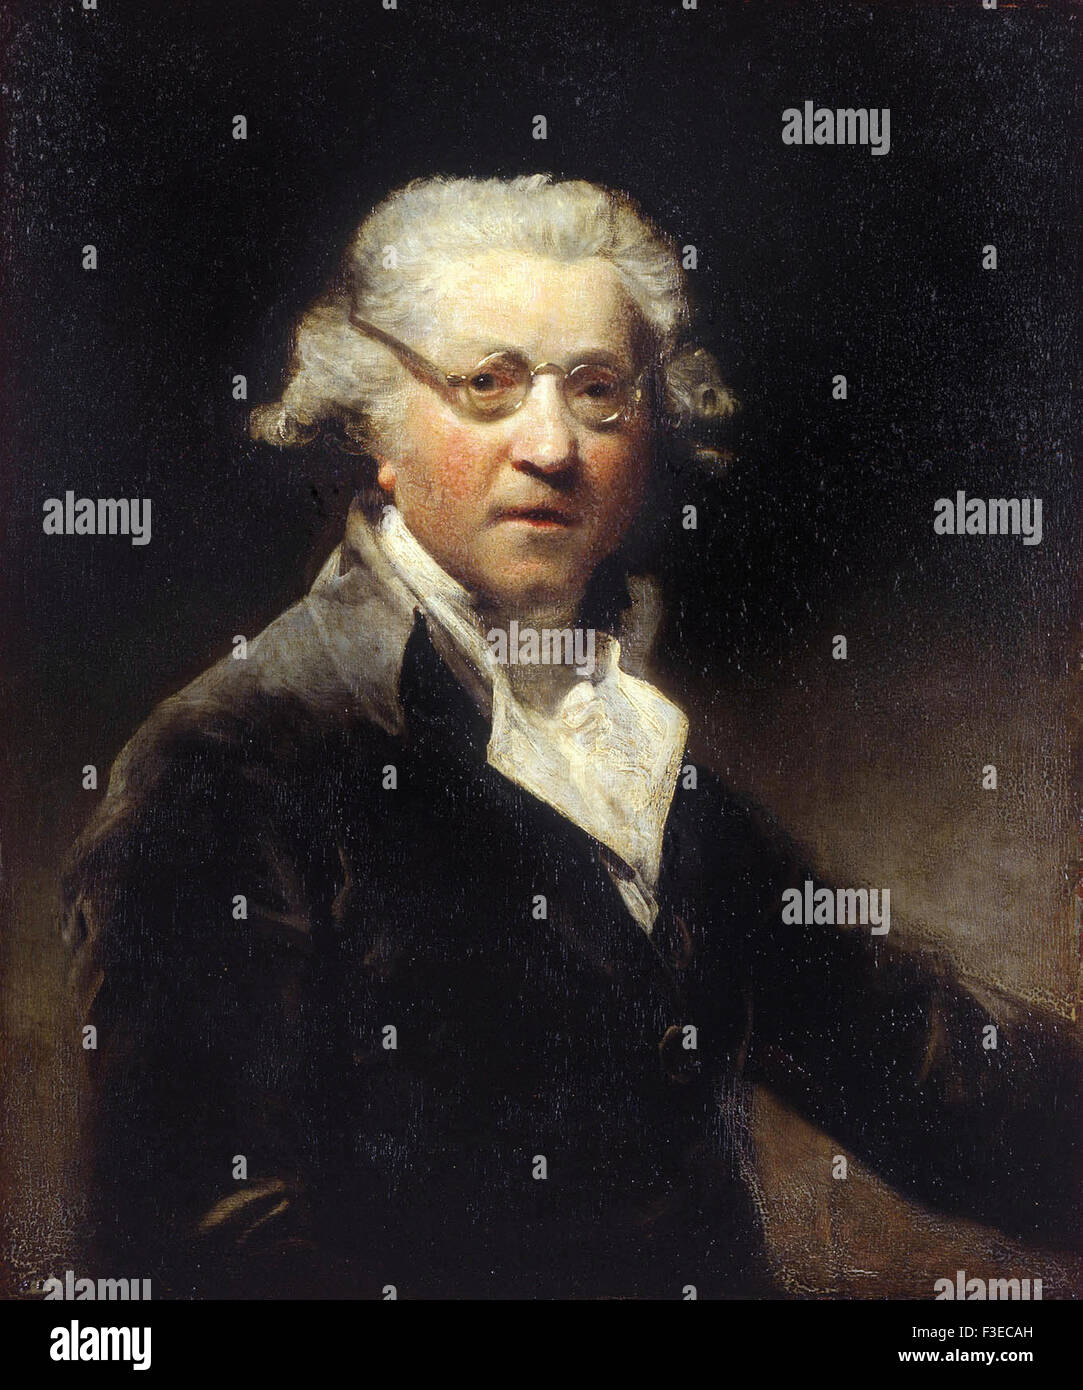 Sir Joshua Reynolds - Self portrait - Stock Image